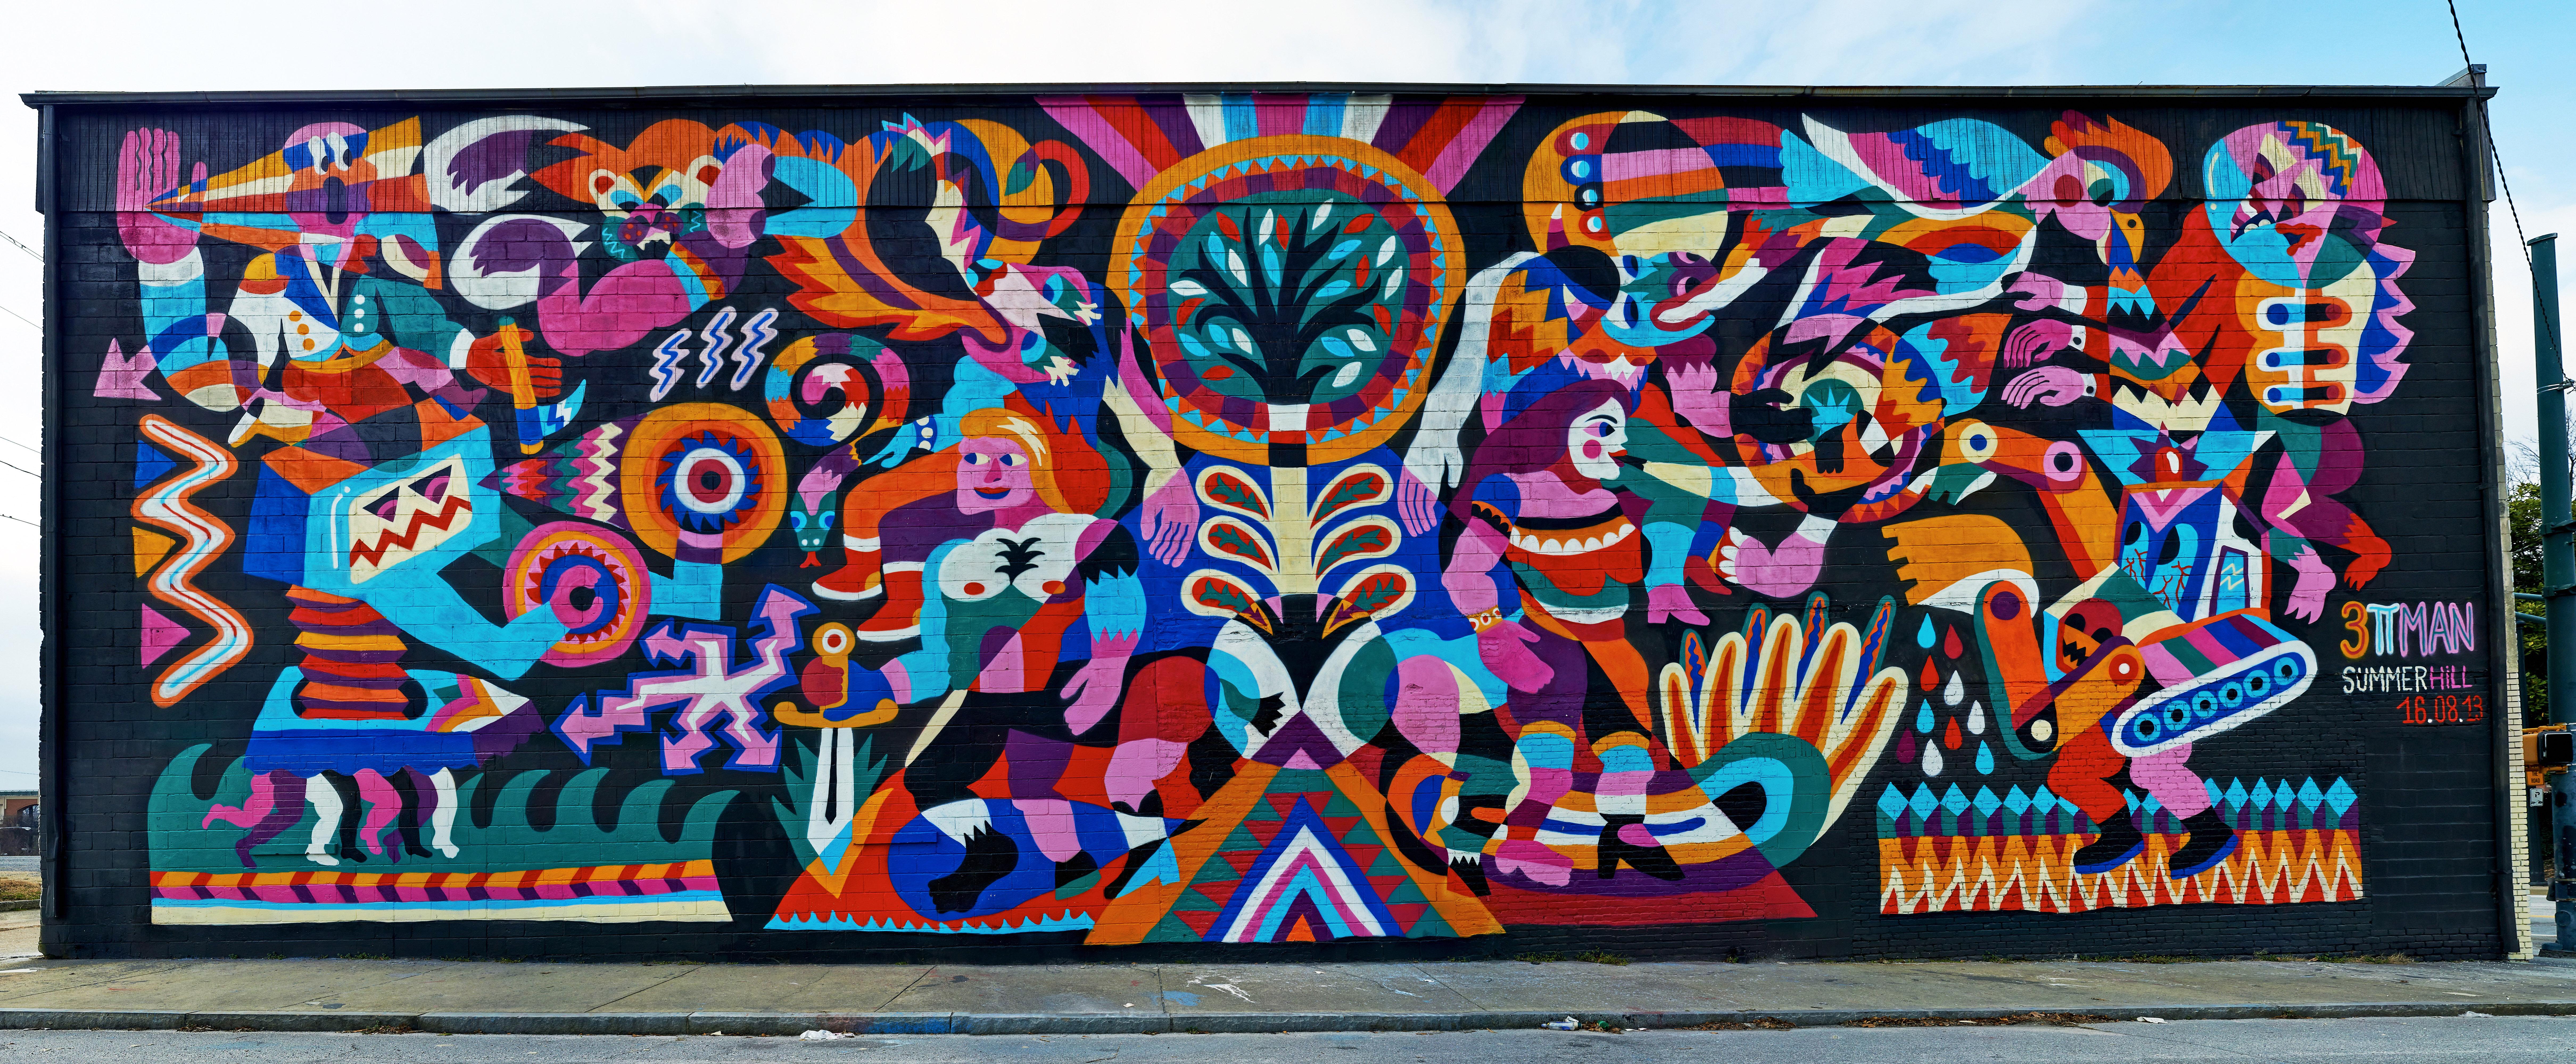 French artist 3ttman in Summerhill, Atlanta for Living Walls 2013.